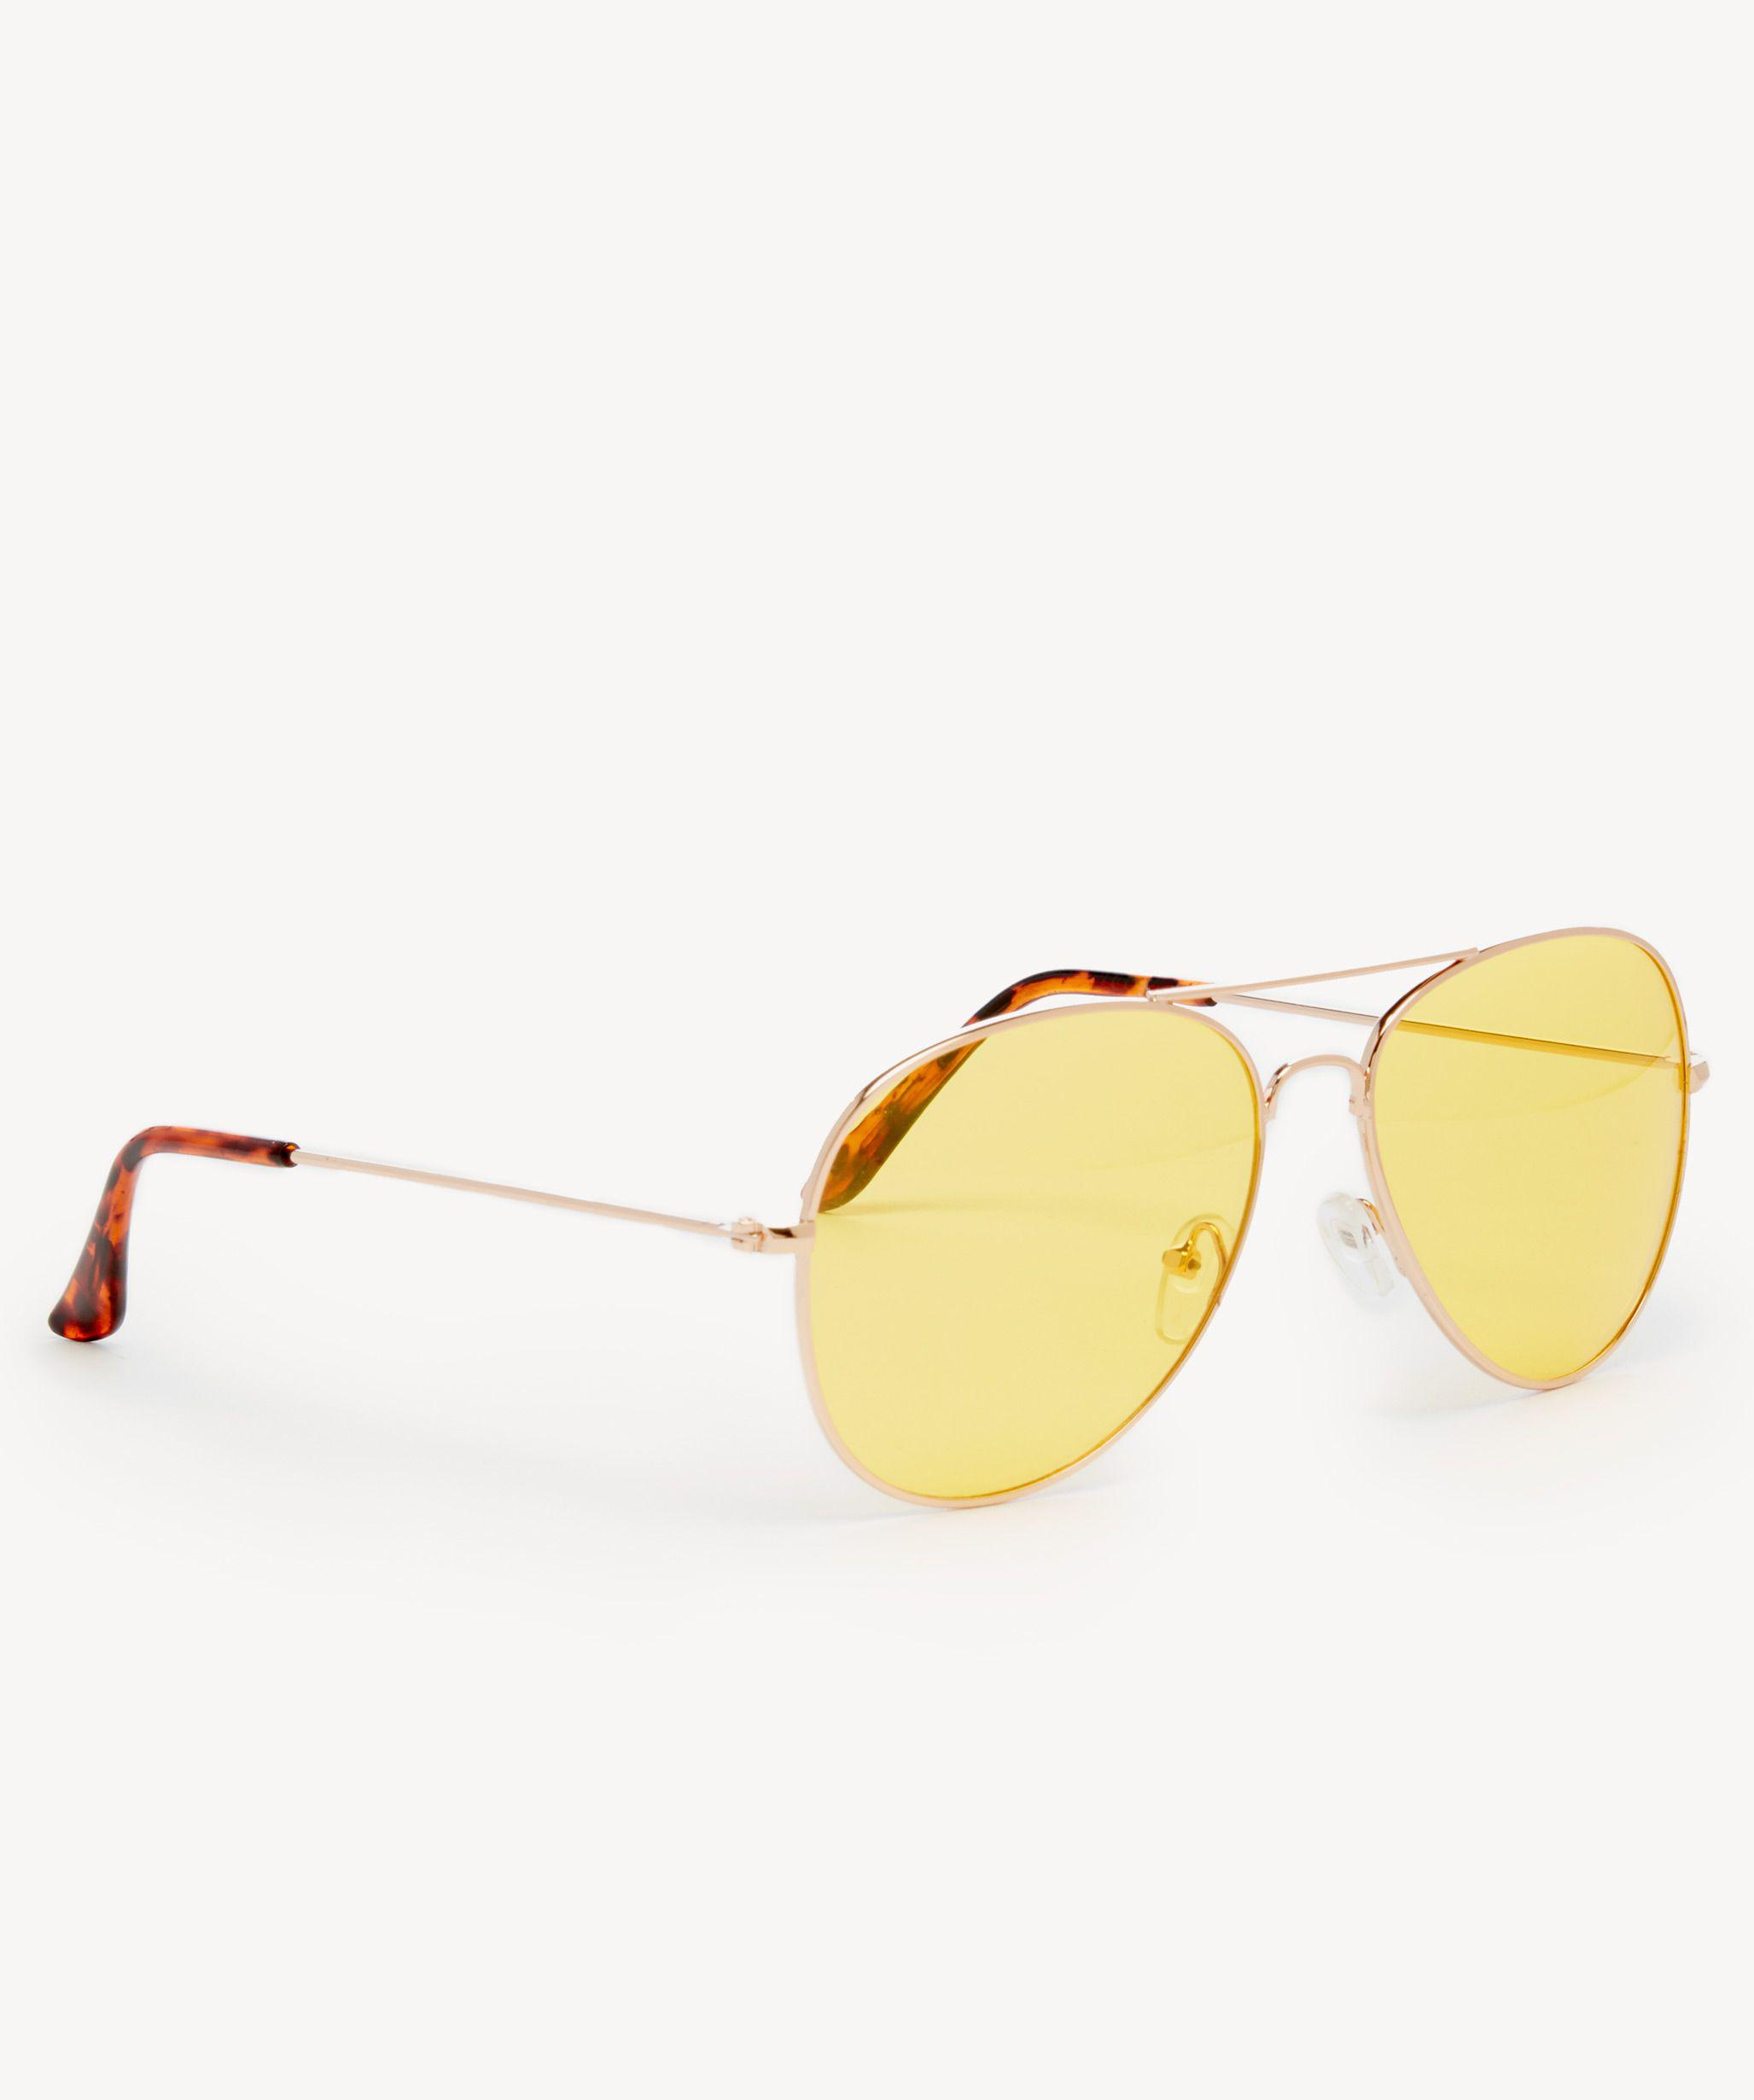 7de9dec9602 Lyst - Sole Society Lani Clear Lens Aviator Sunglasses in Metallic